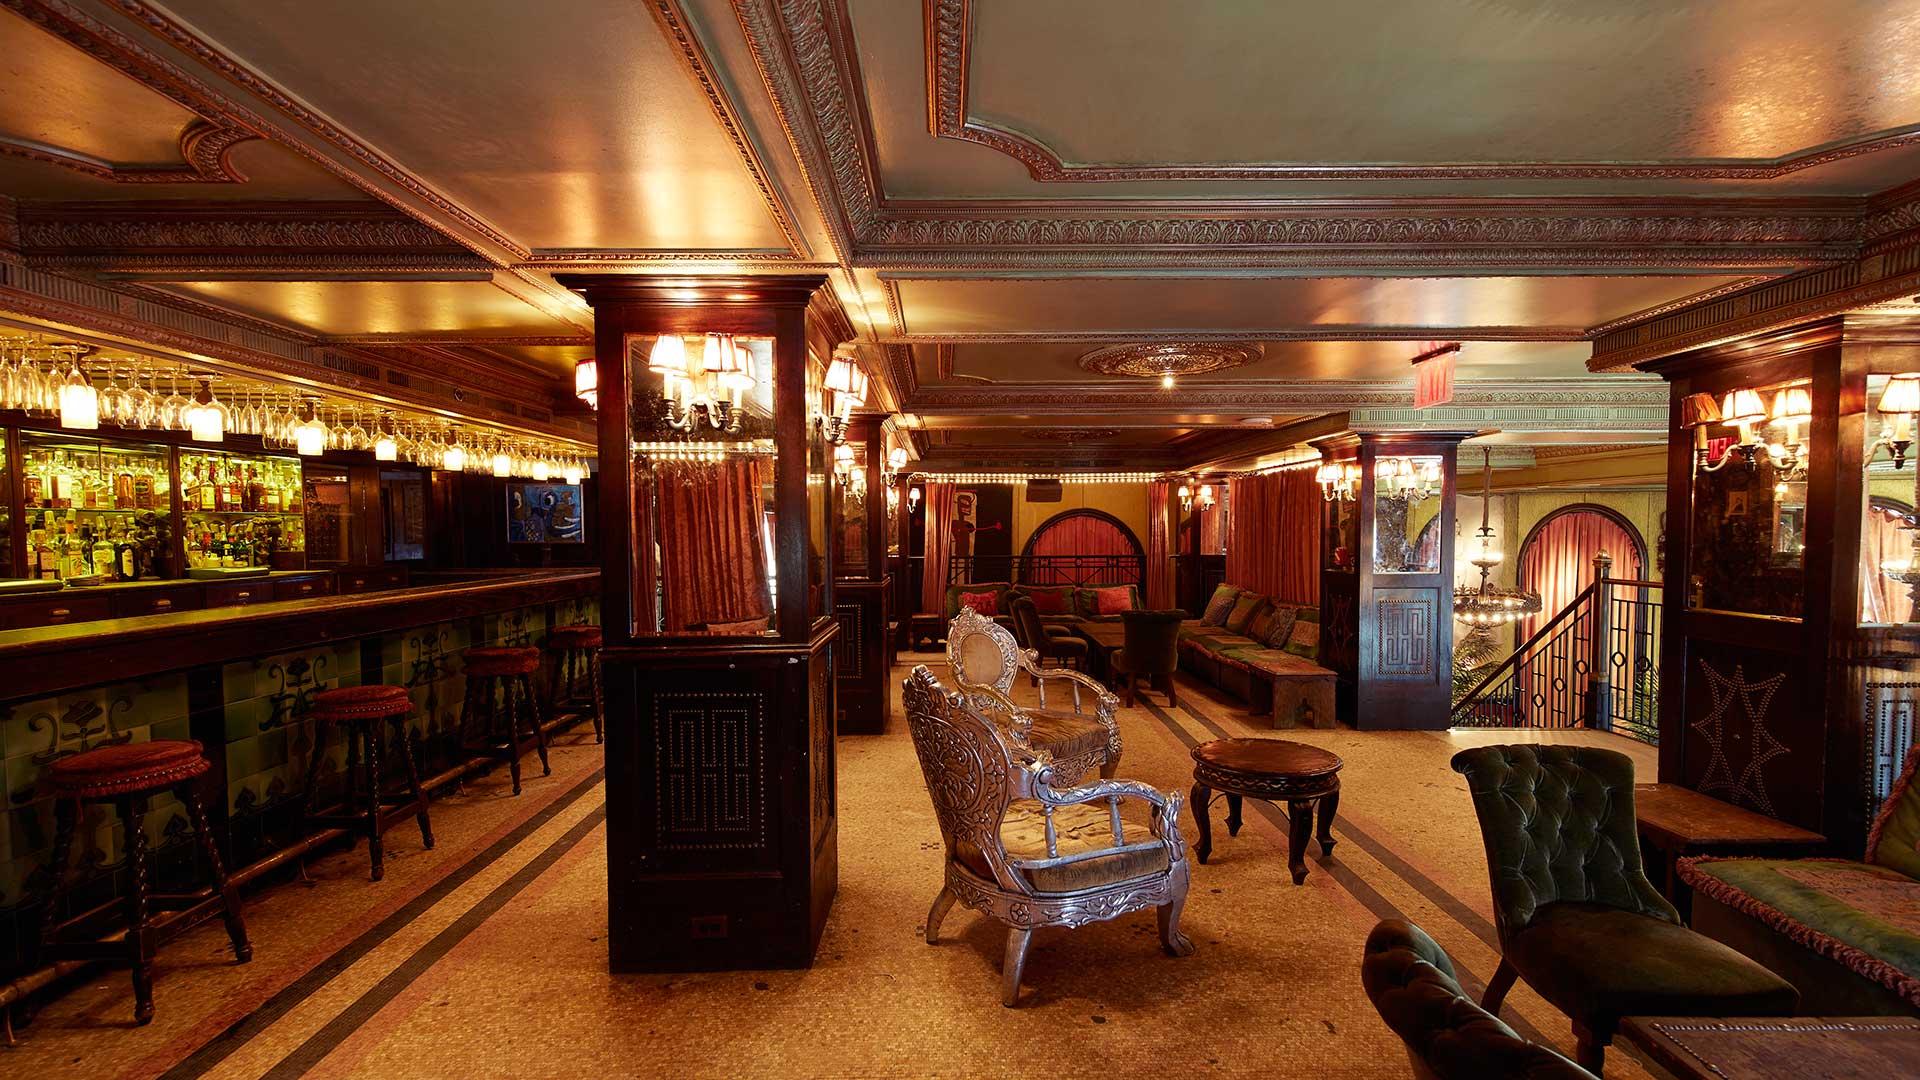 Years Eve Jane Hotel Ballroom - Tickets